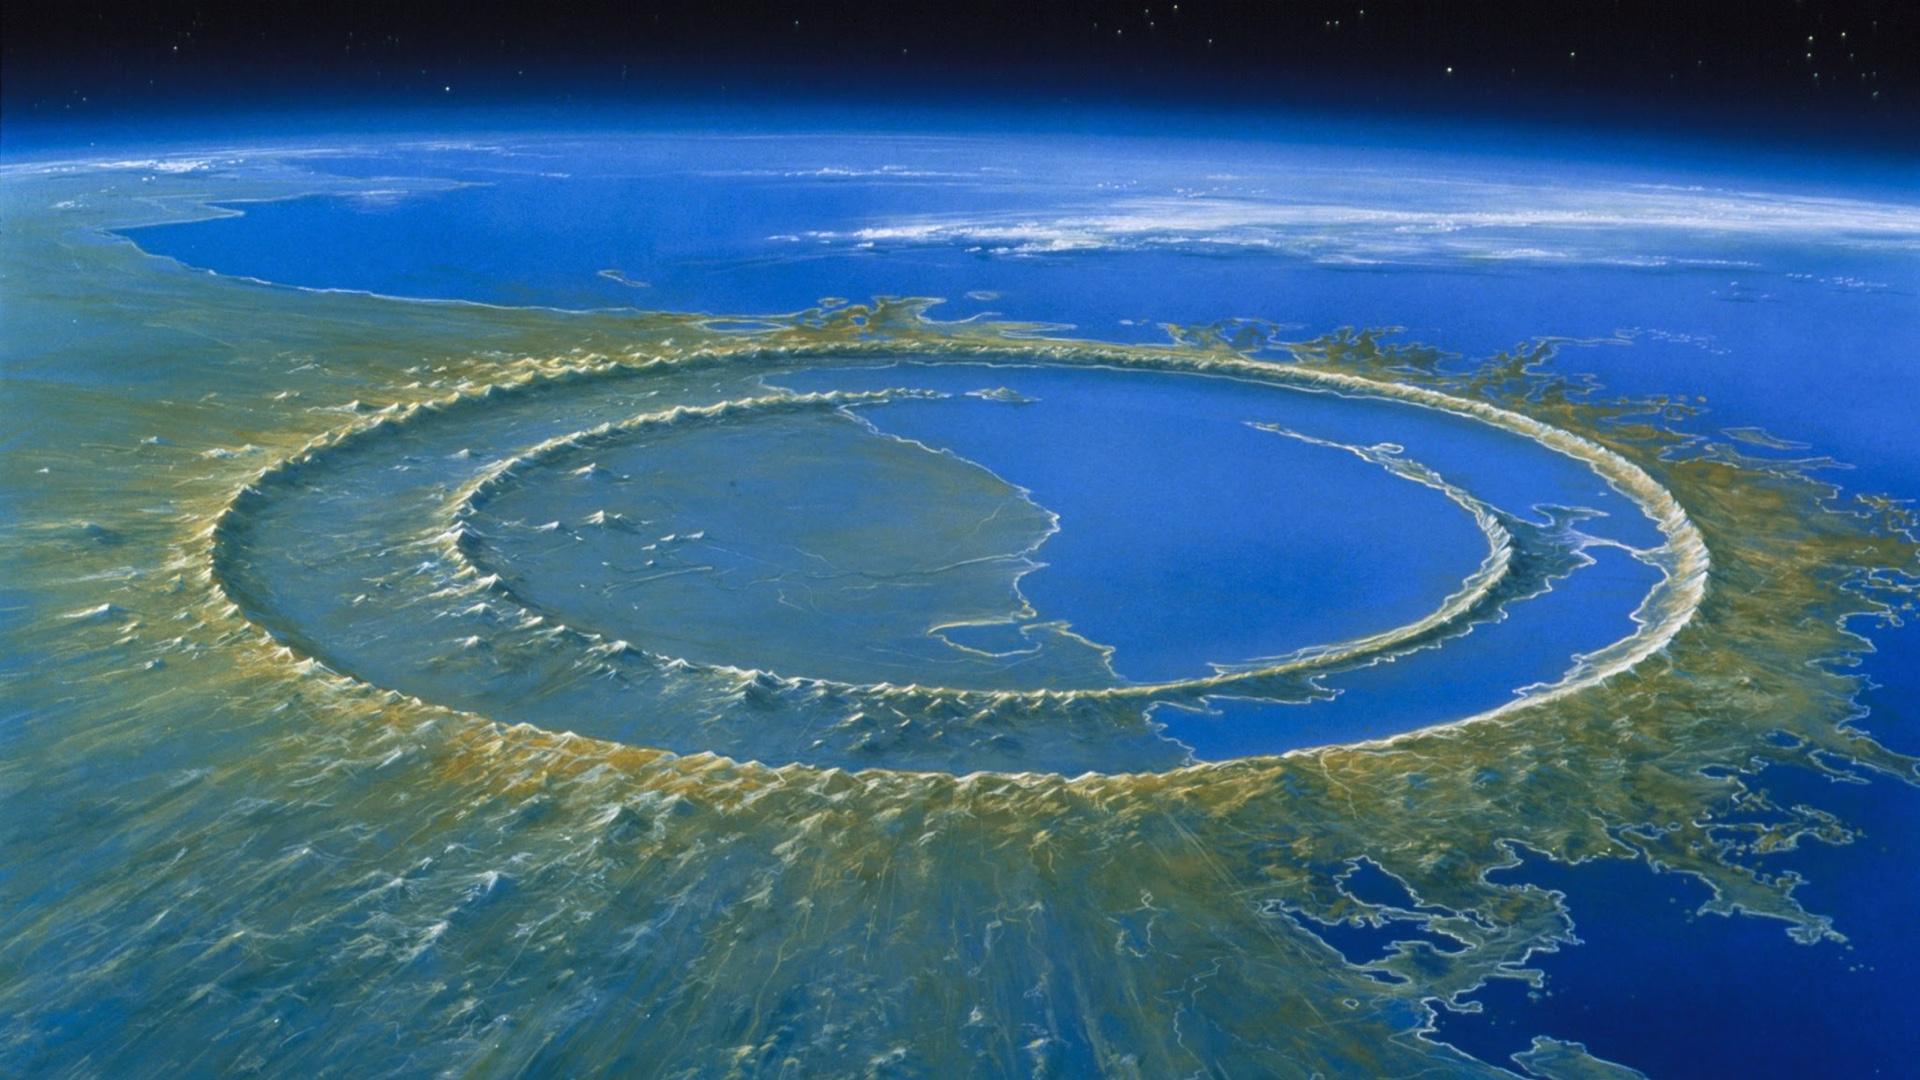 Crater Yucatán